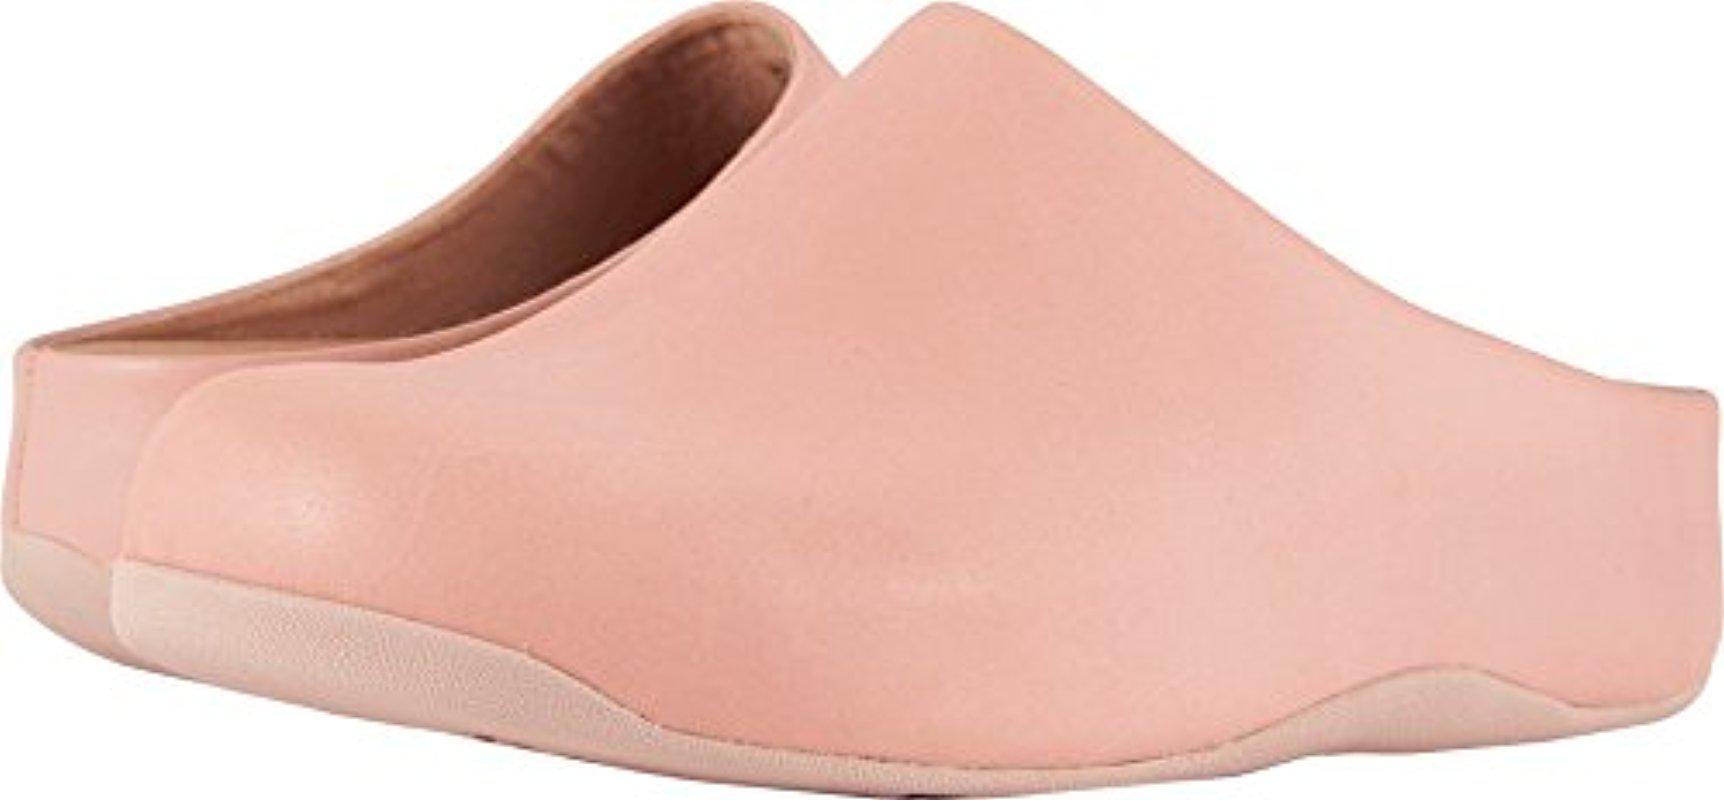 200996bda Lyst fitflop shuv leather medical professional shoe in pink jpg 1724x800  Fit flops shuv